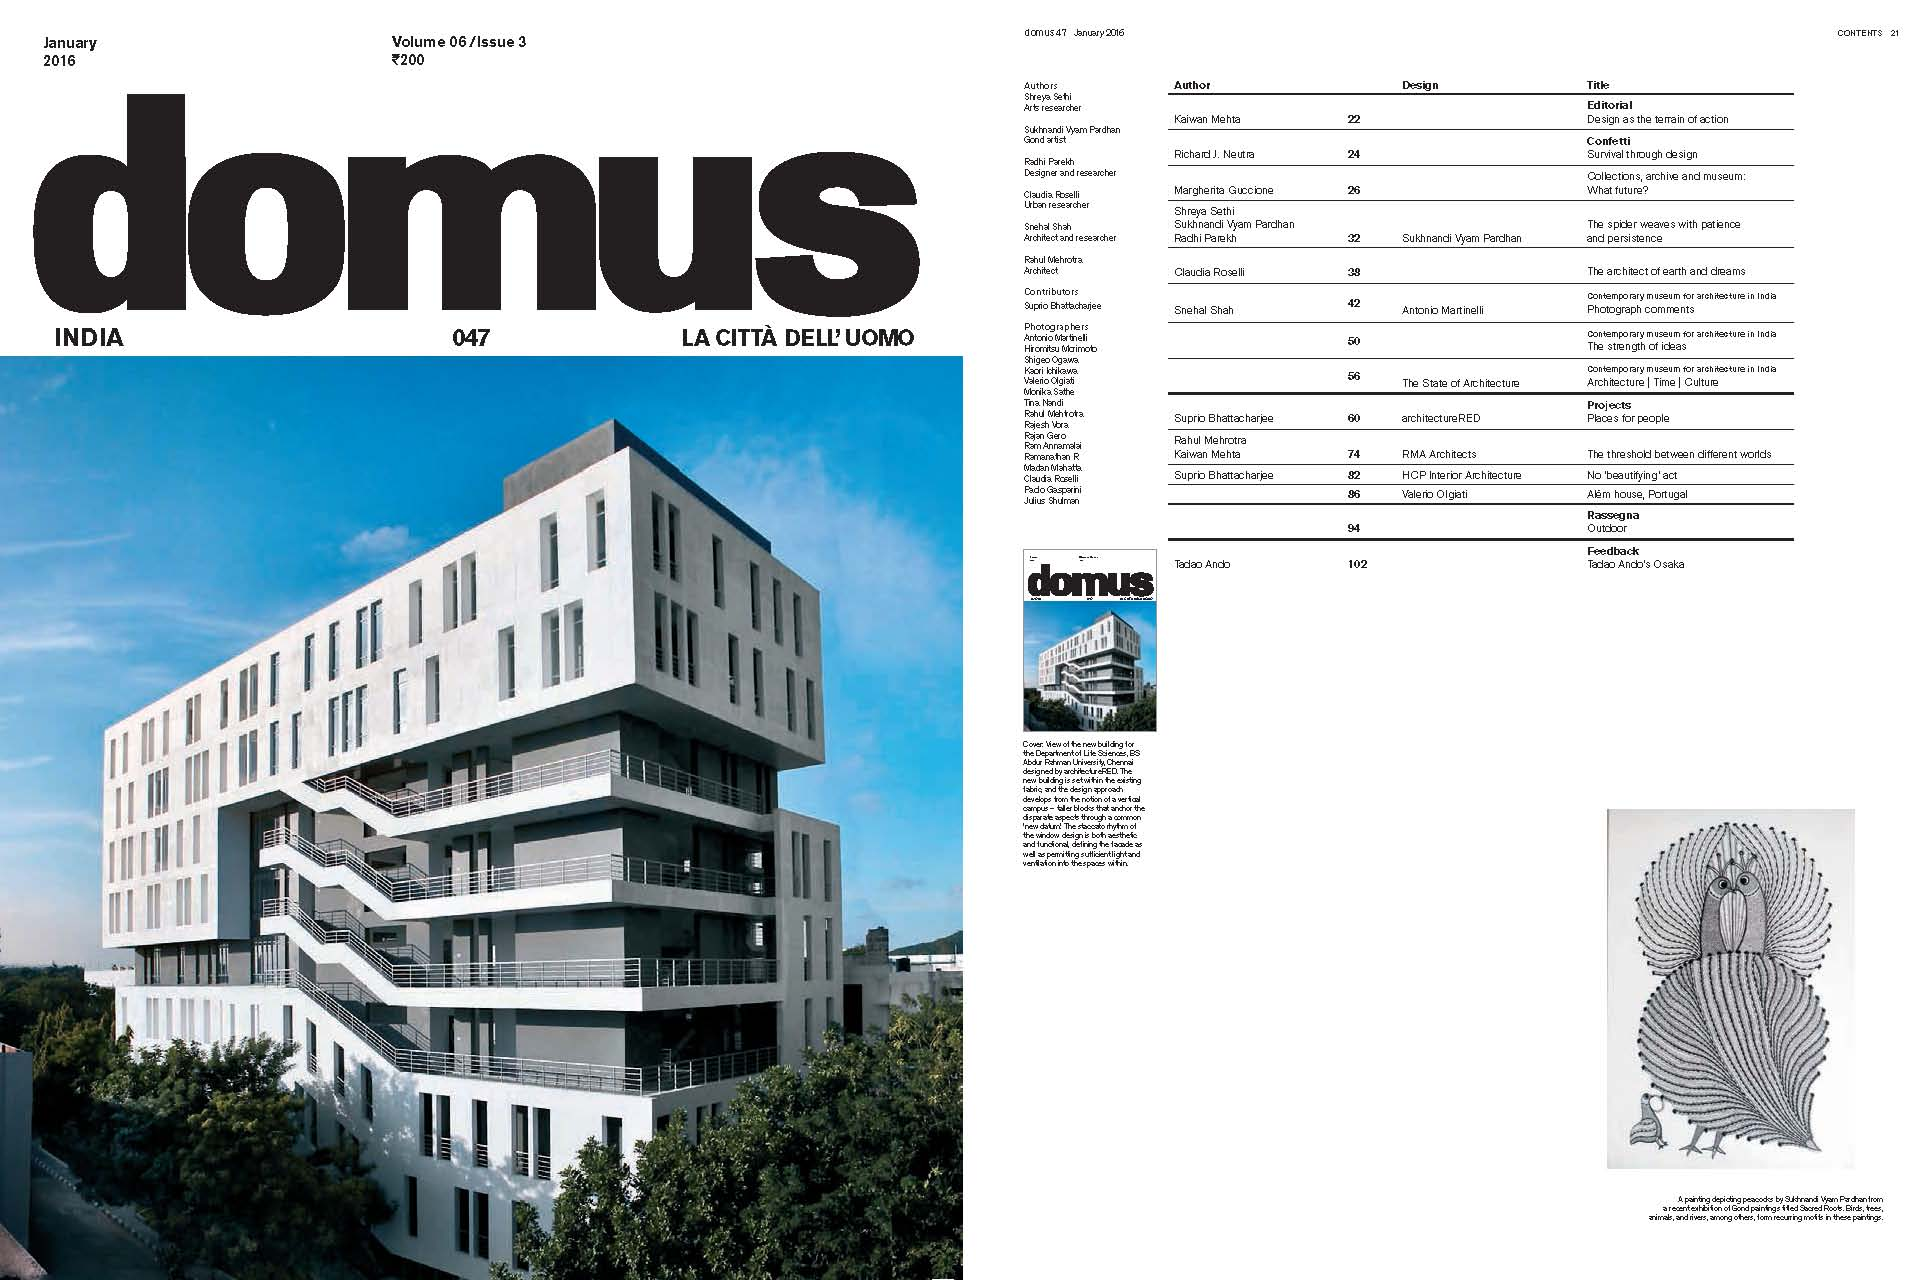 Domus Magazine_Canna Patel_Jan 2016-2_Page_1.jpg